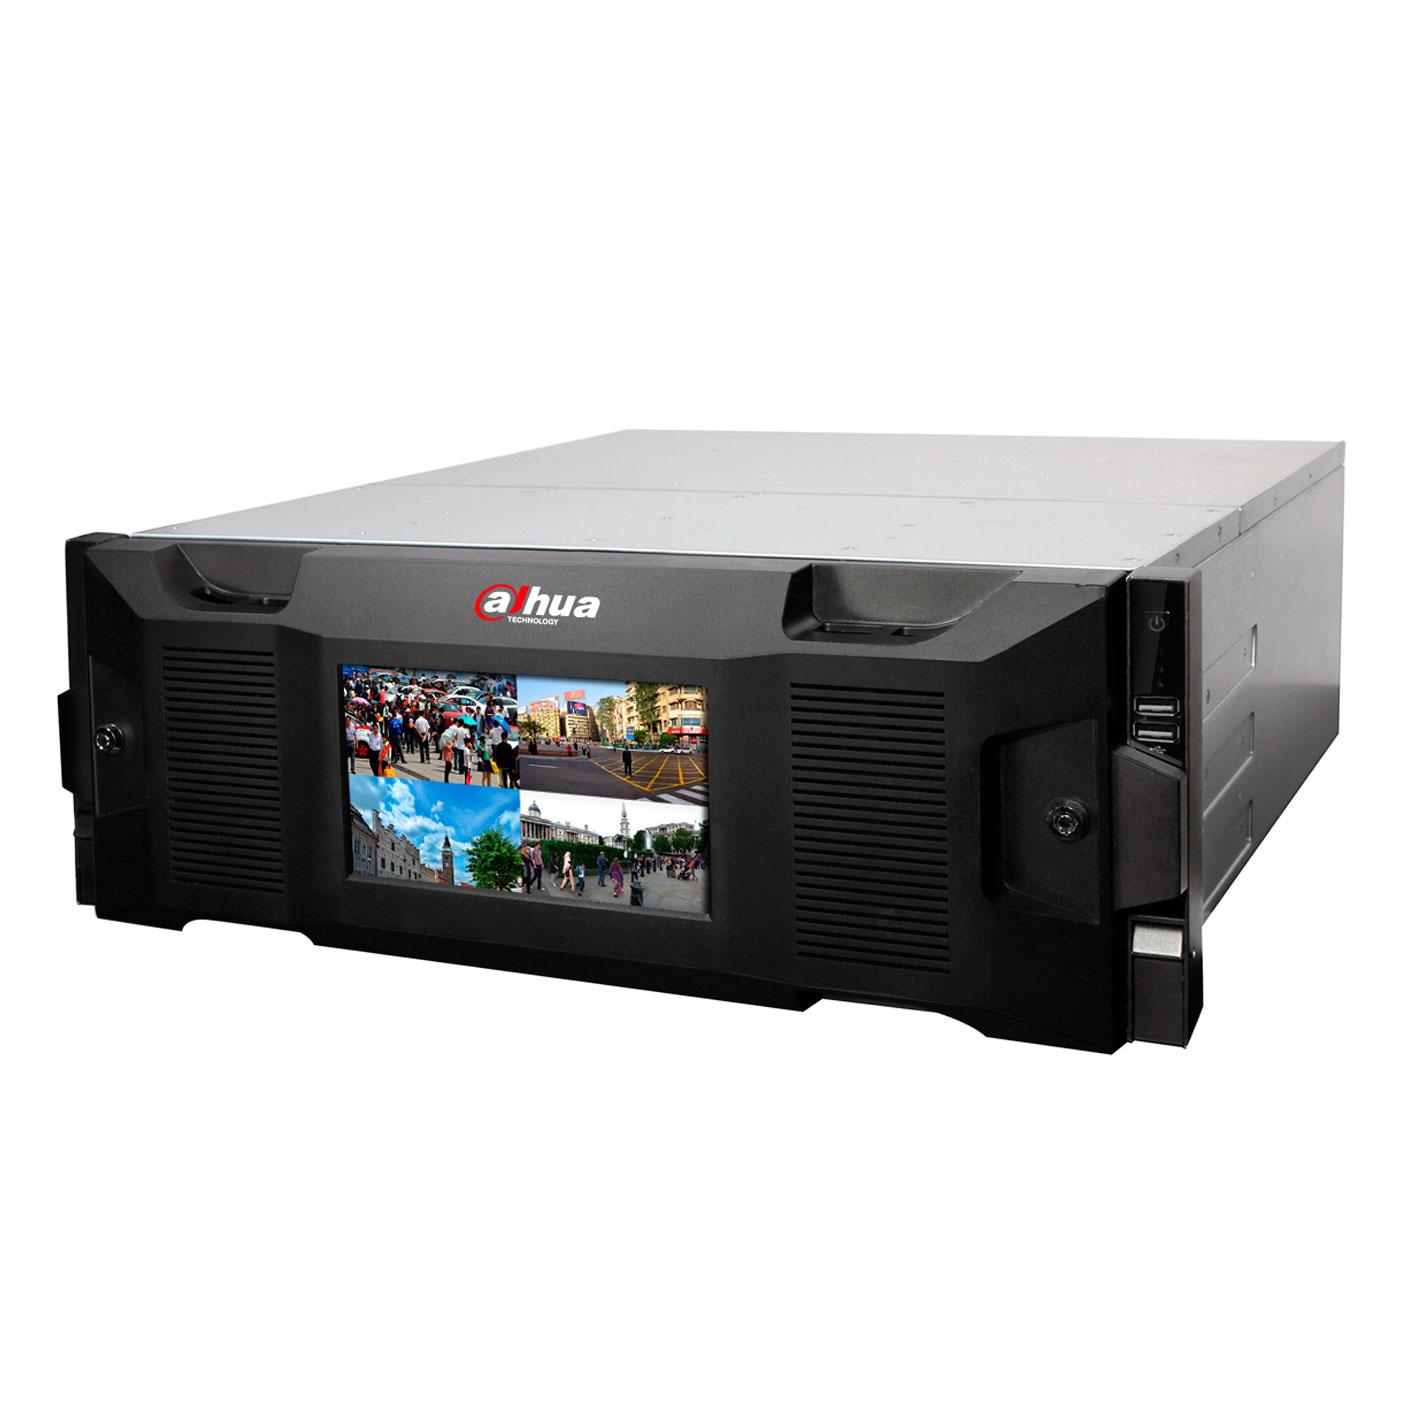 256 Kanal 4U Ultra NVR